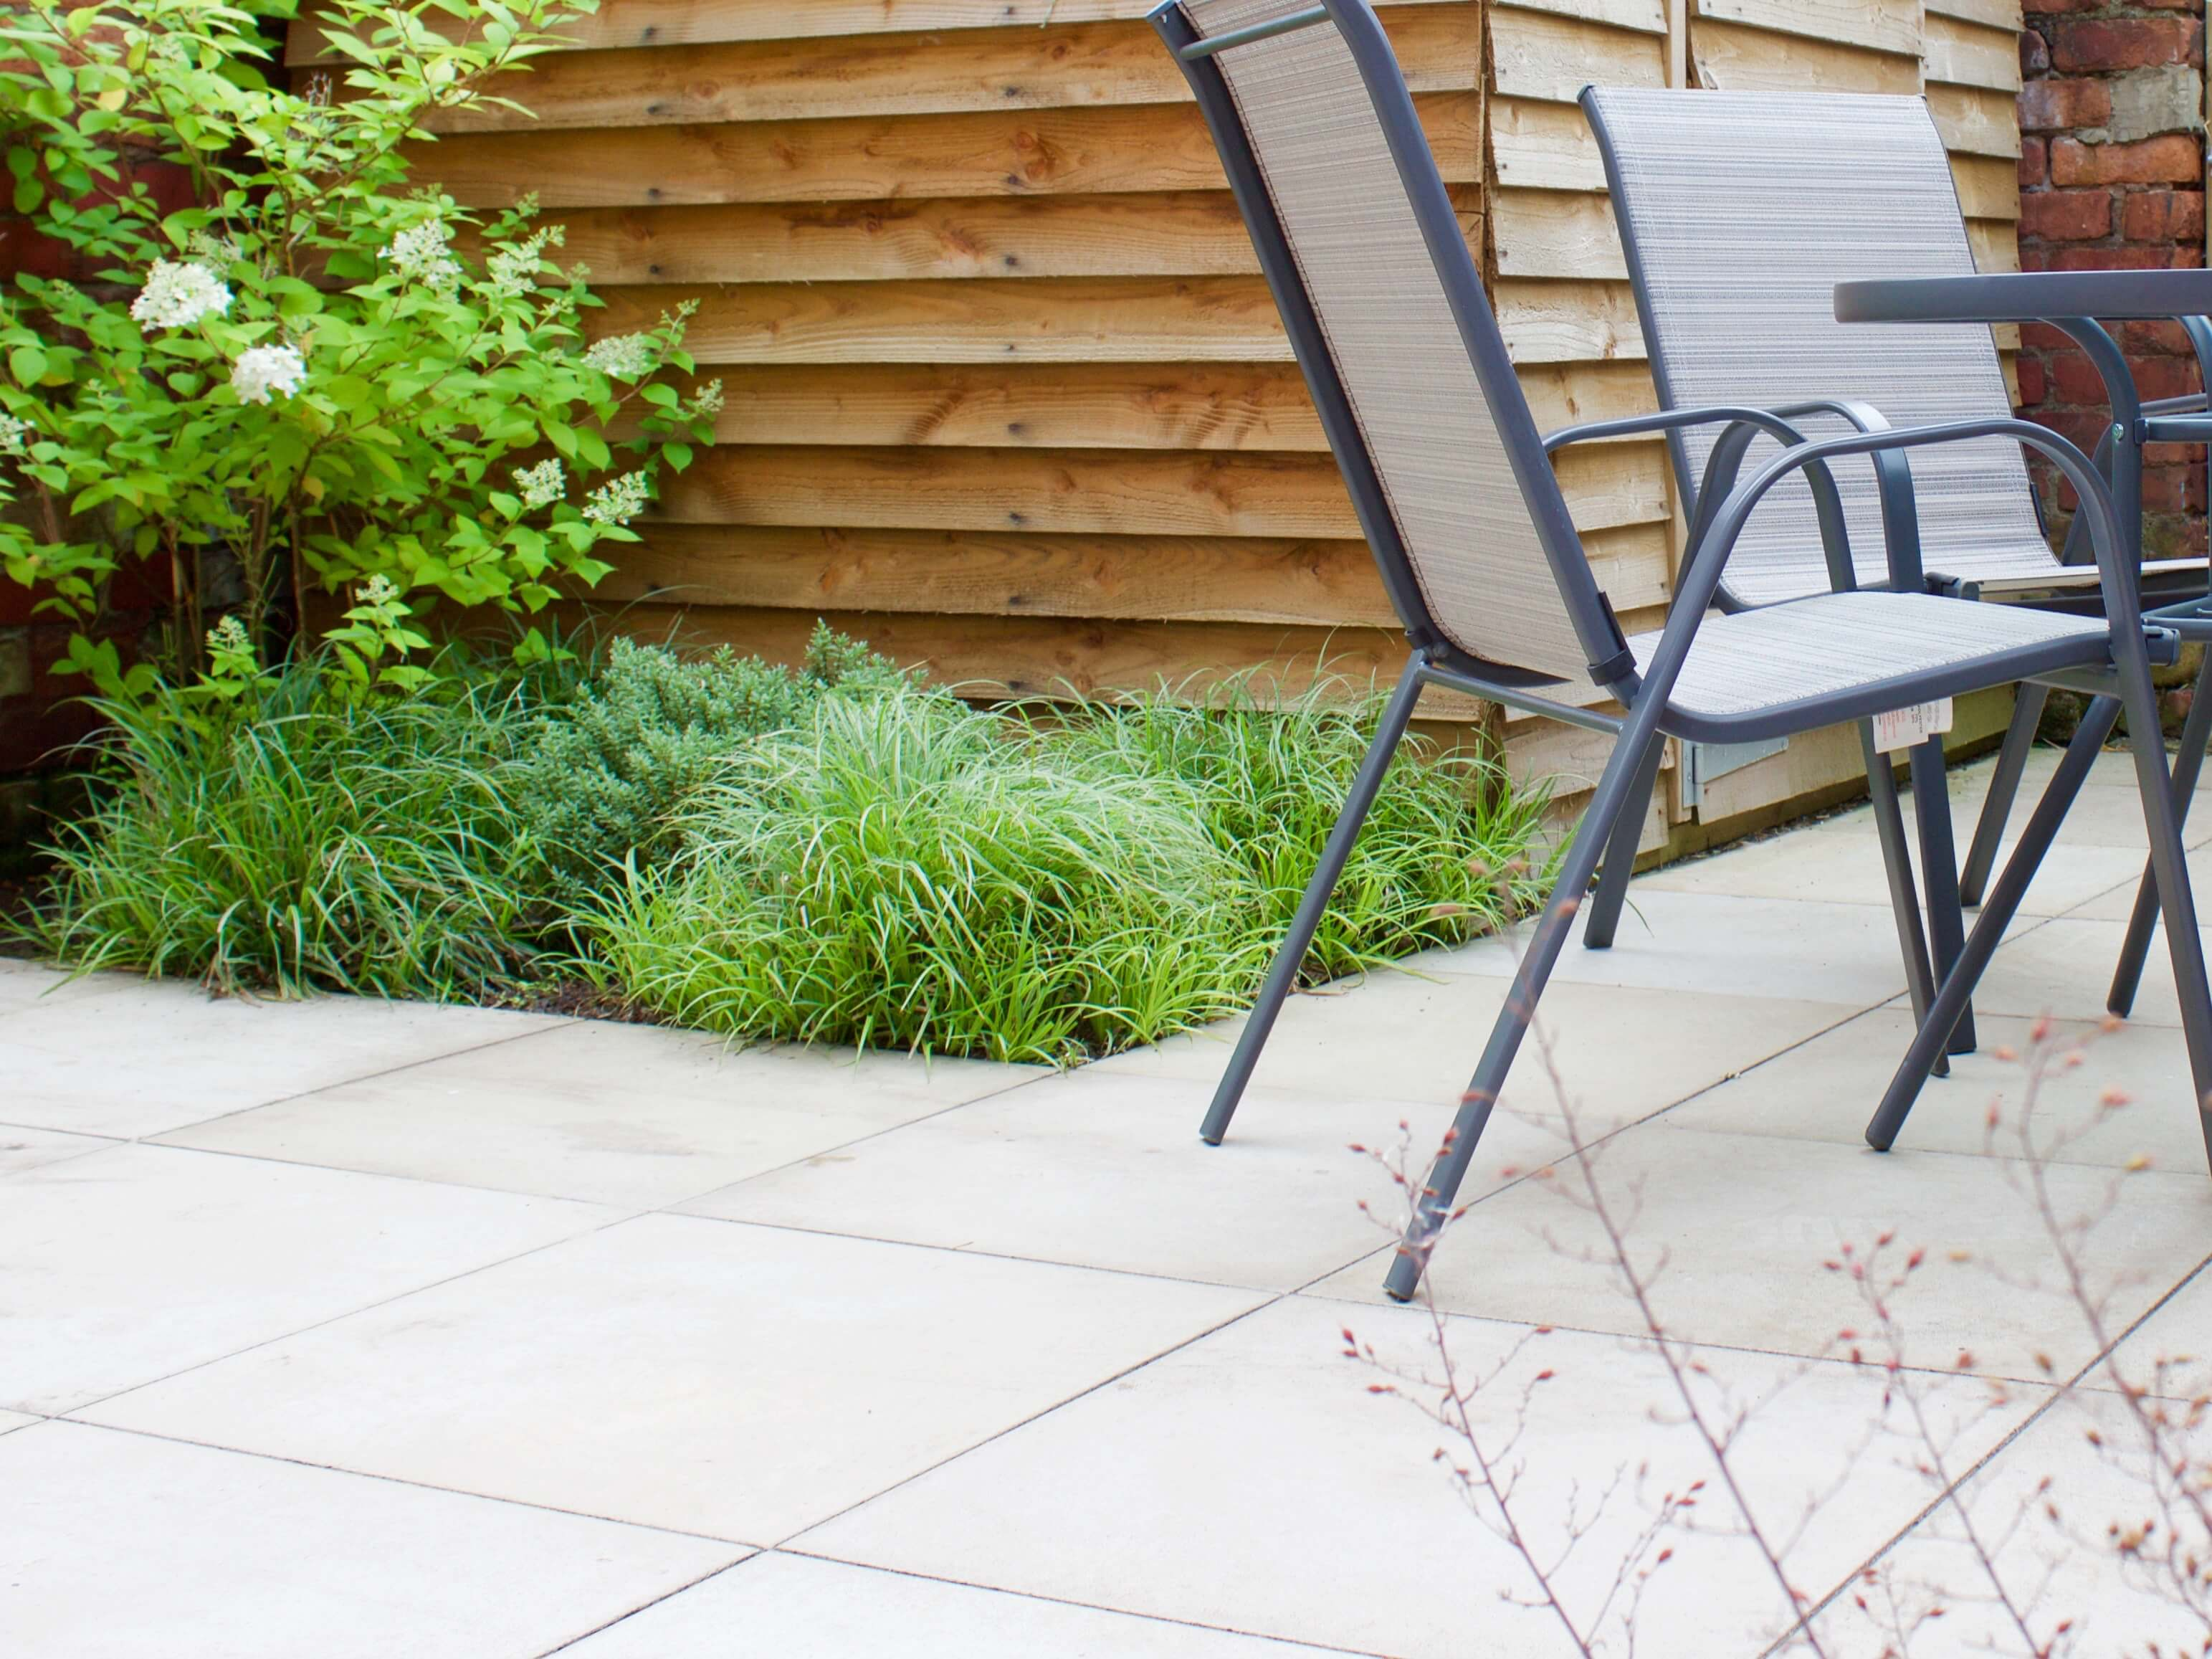 small courtyard garden design in manchester and cheshire, altrincham, didsbury, chorlton, wilmslow, alderley edge, sale, knutsford, stockport, lancashire, chester, 2